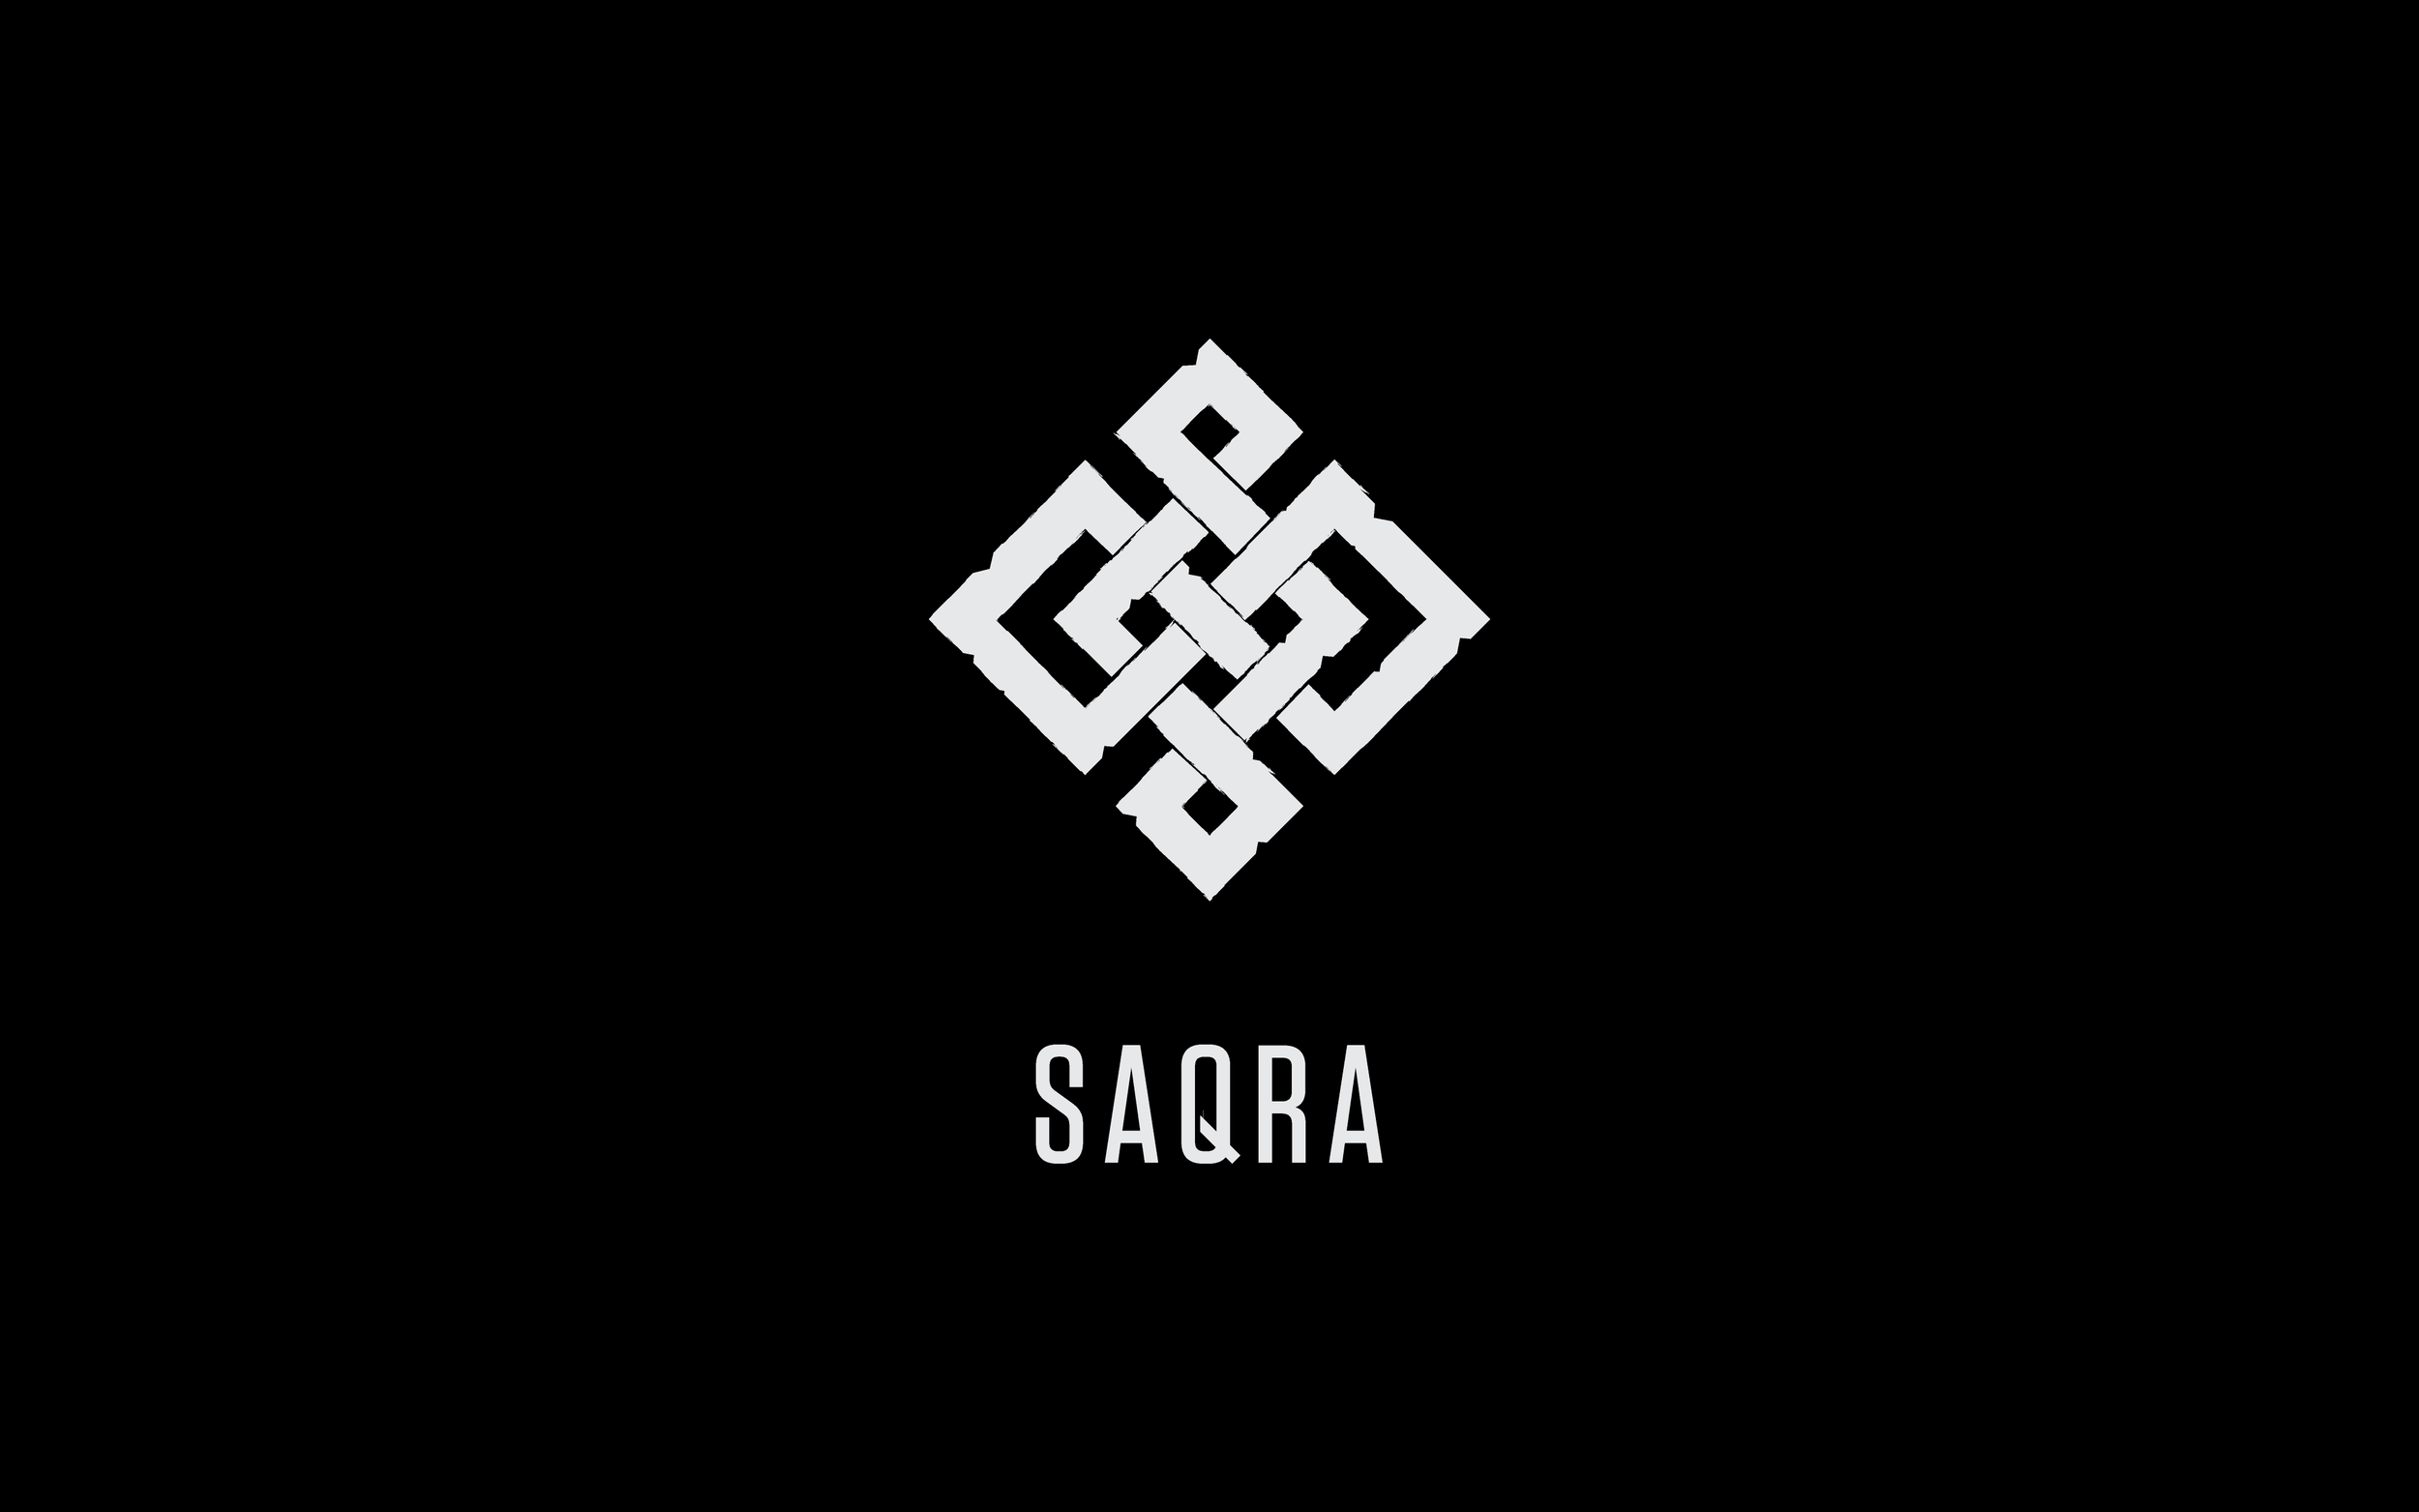 saqra_logo_1.png